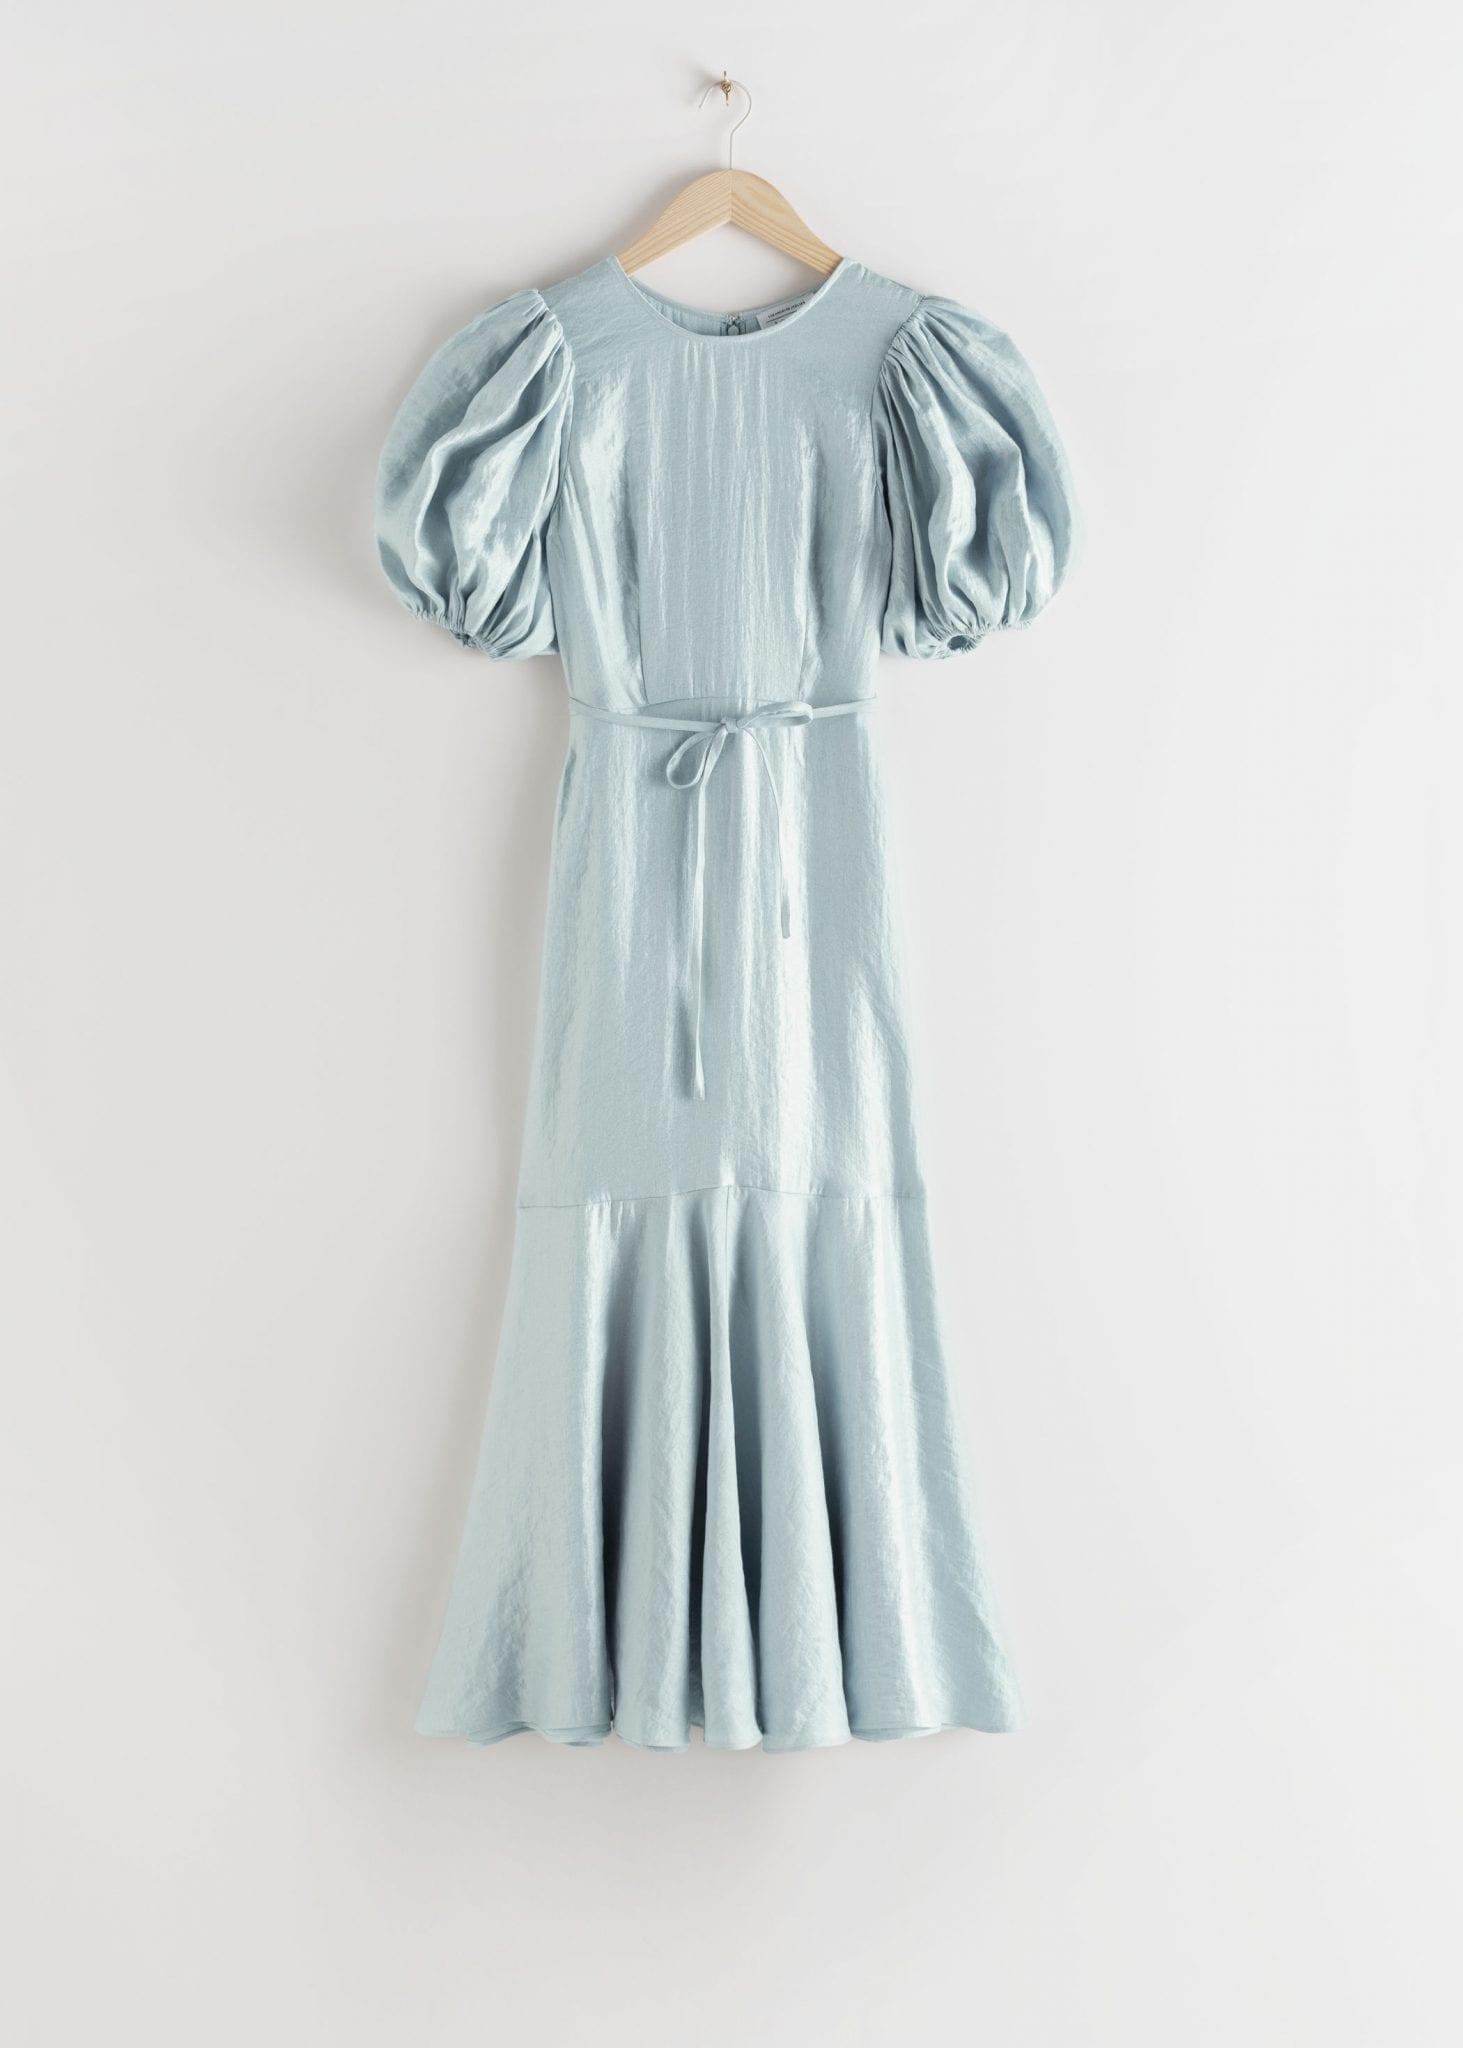 & OTHER STORIES Metallic Crepe Puff Sleeve Midi Dress